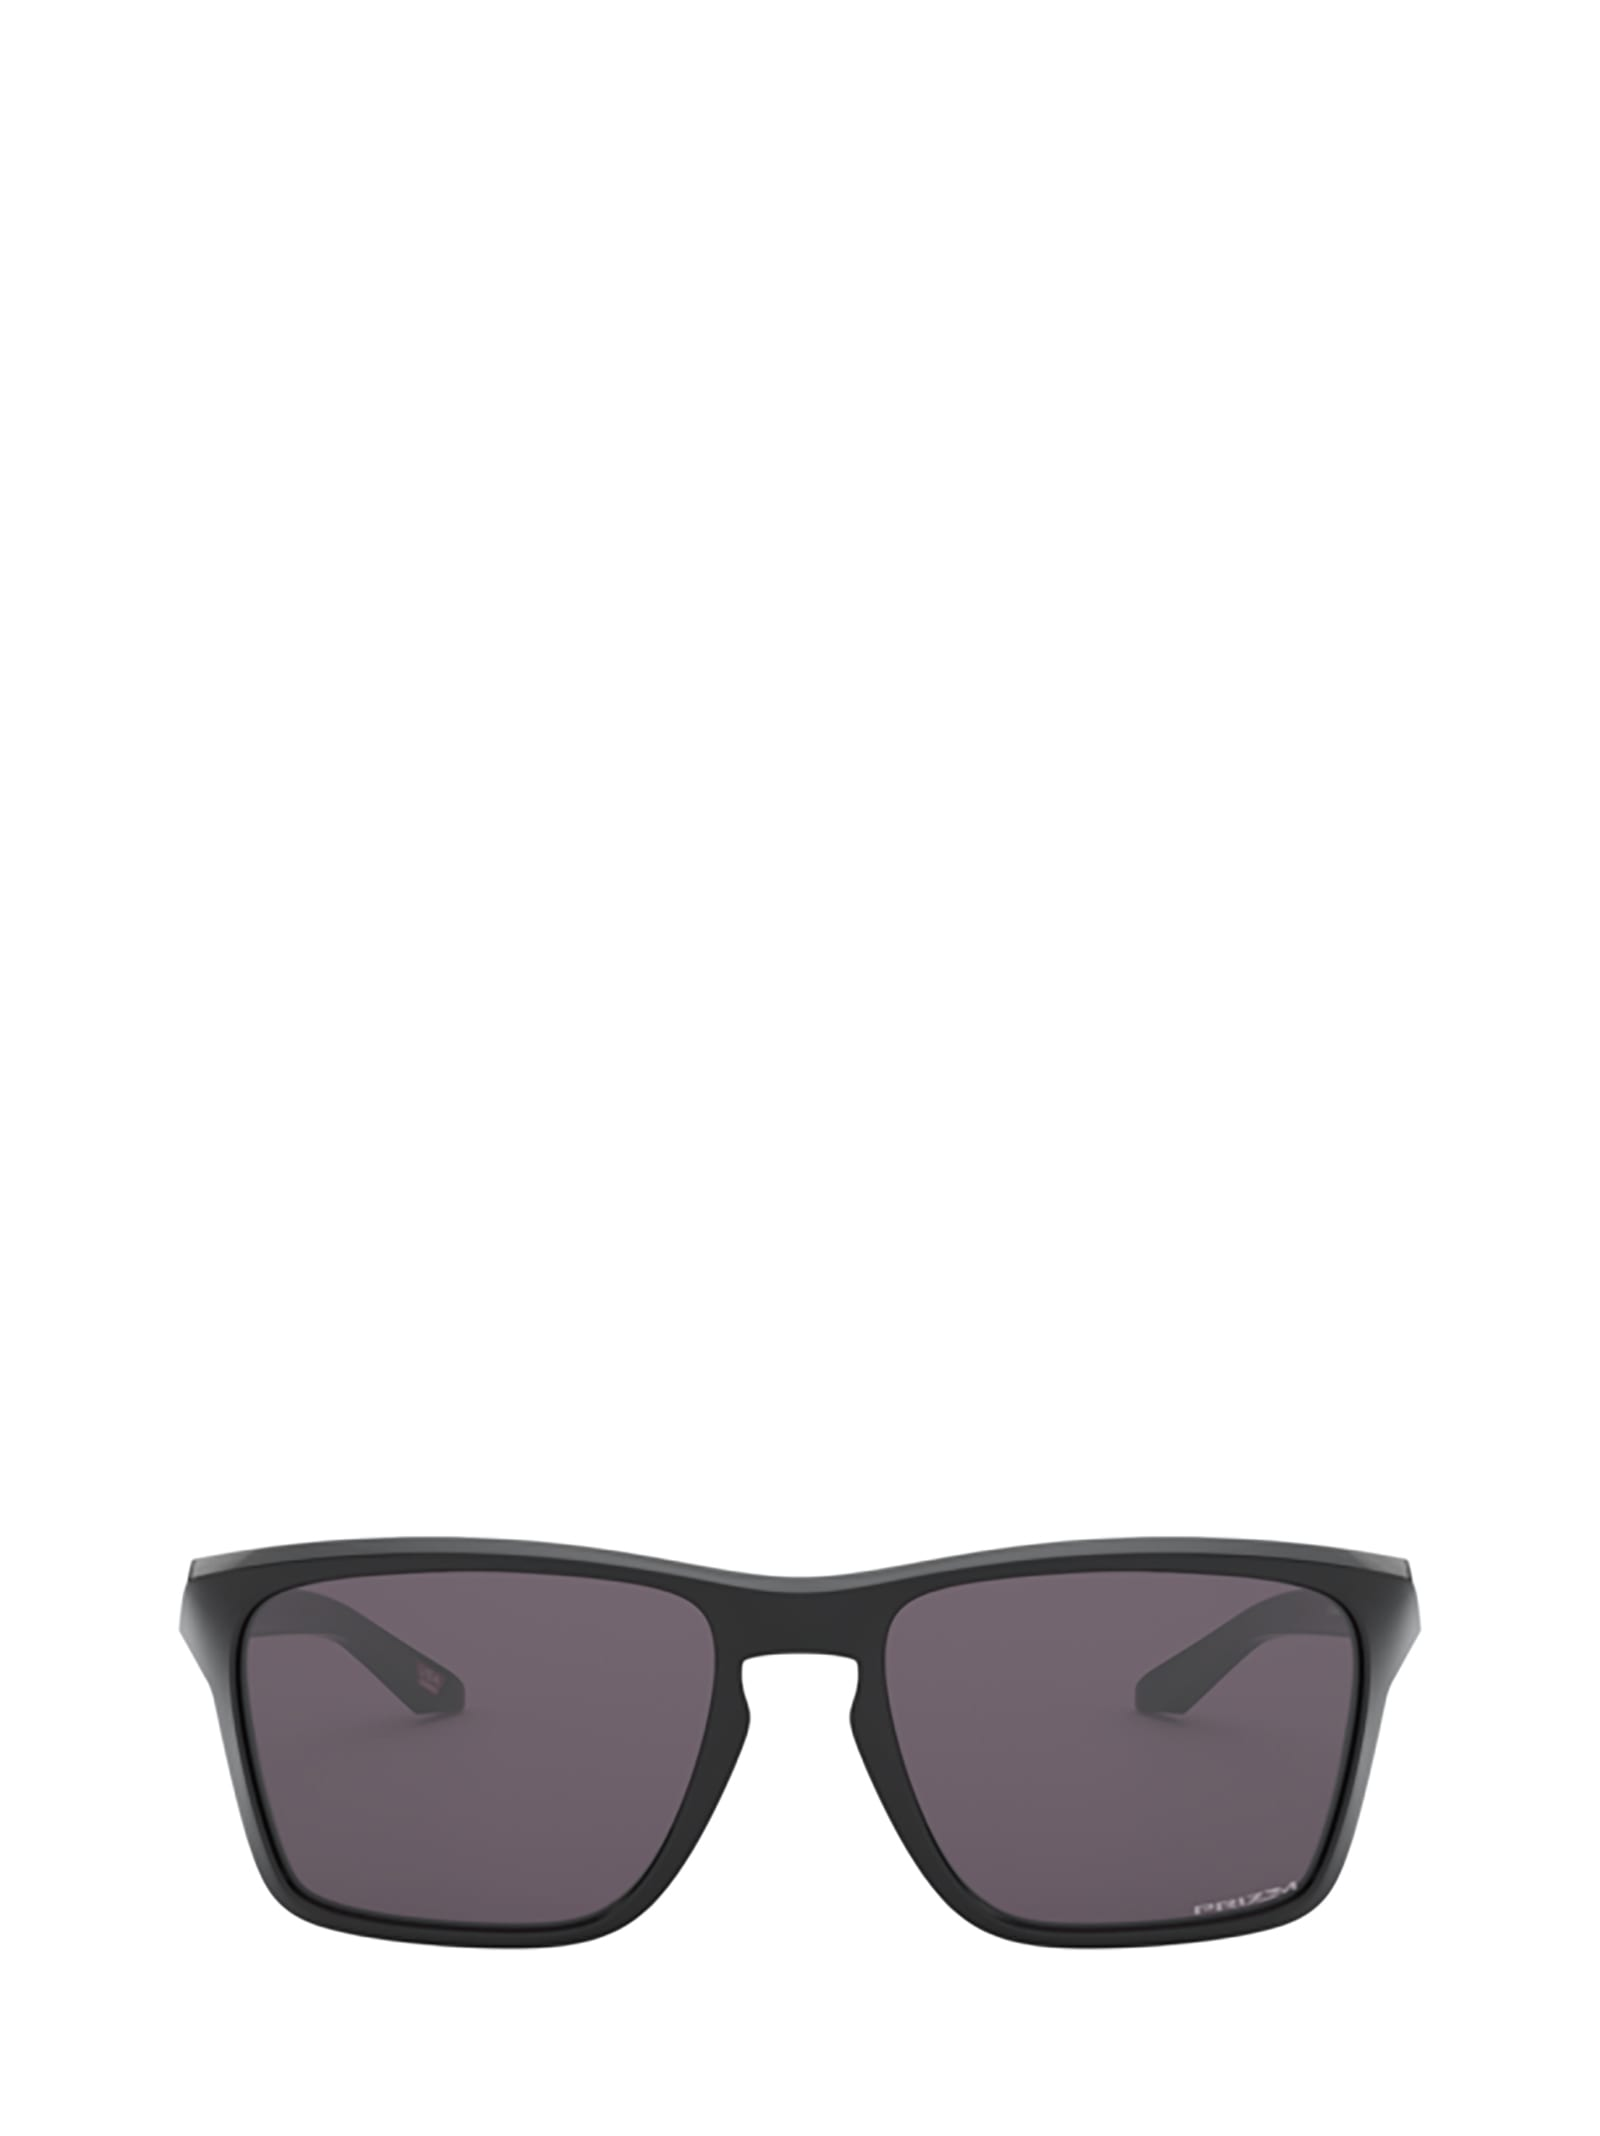 Oakley Oo9448 Polished Black Sunglasses